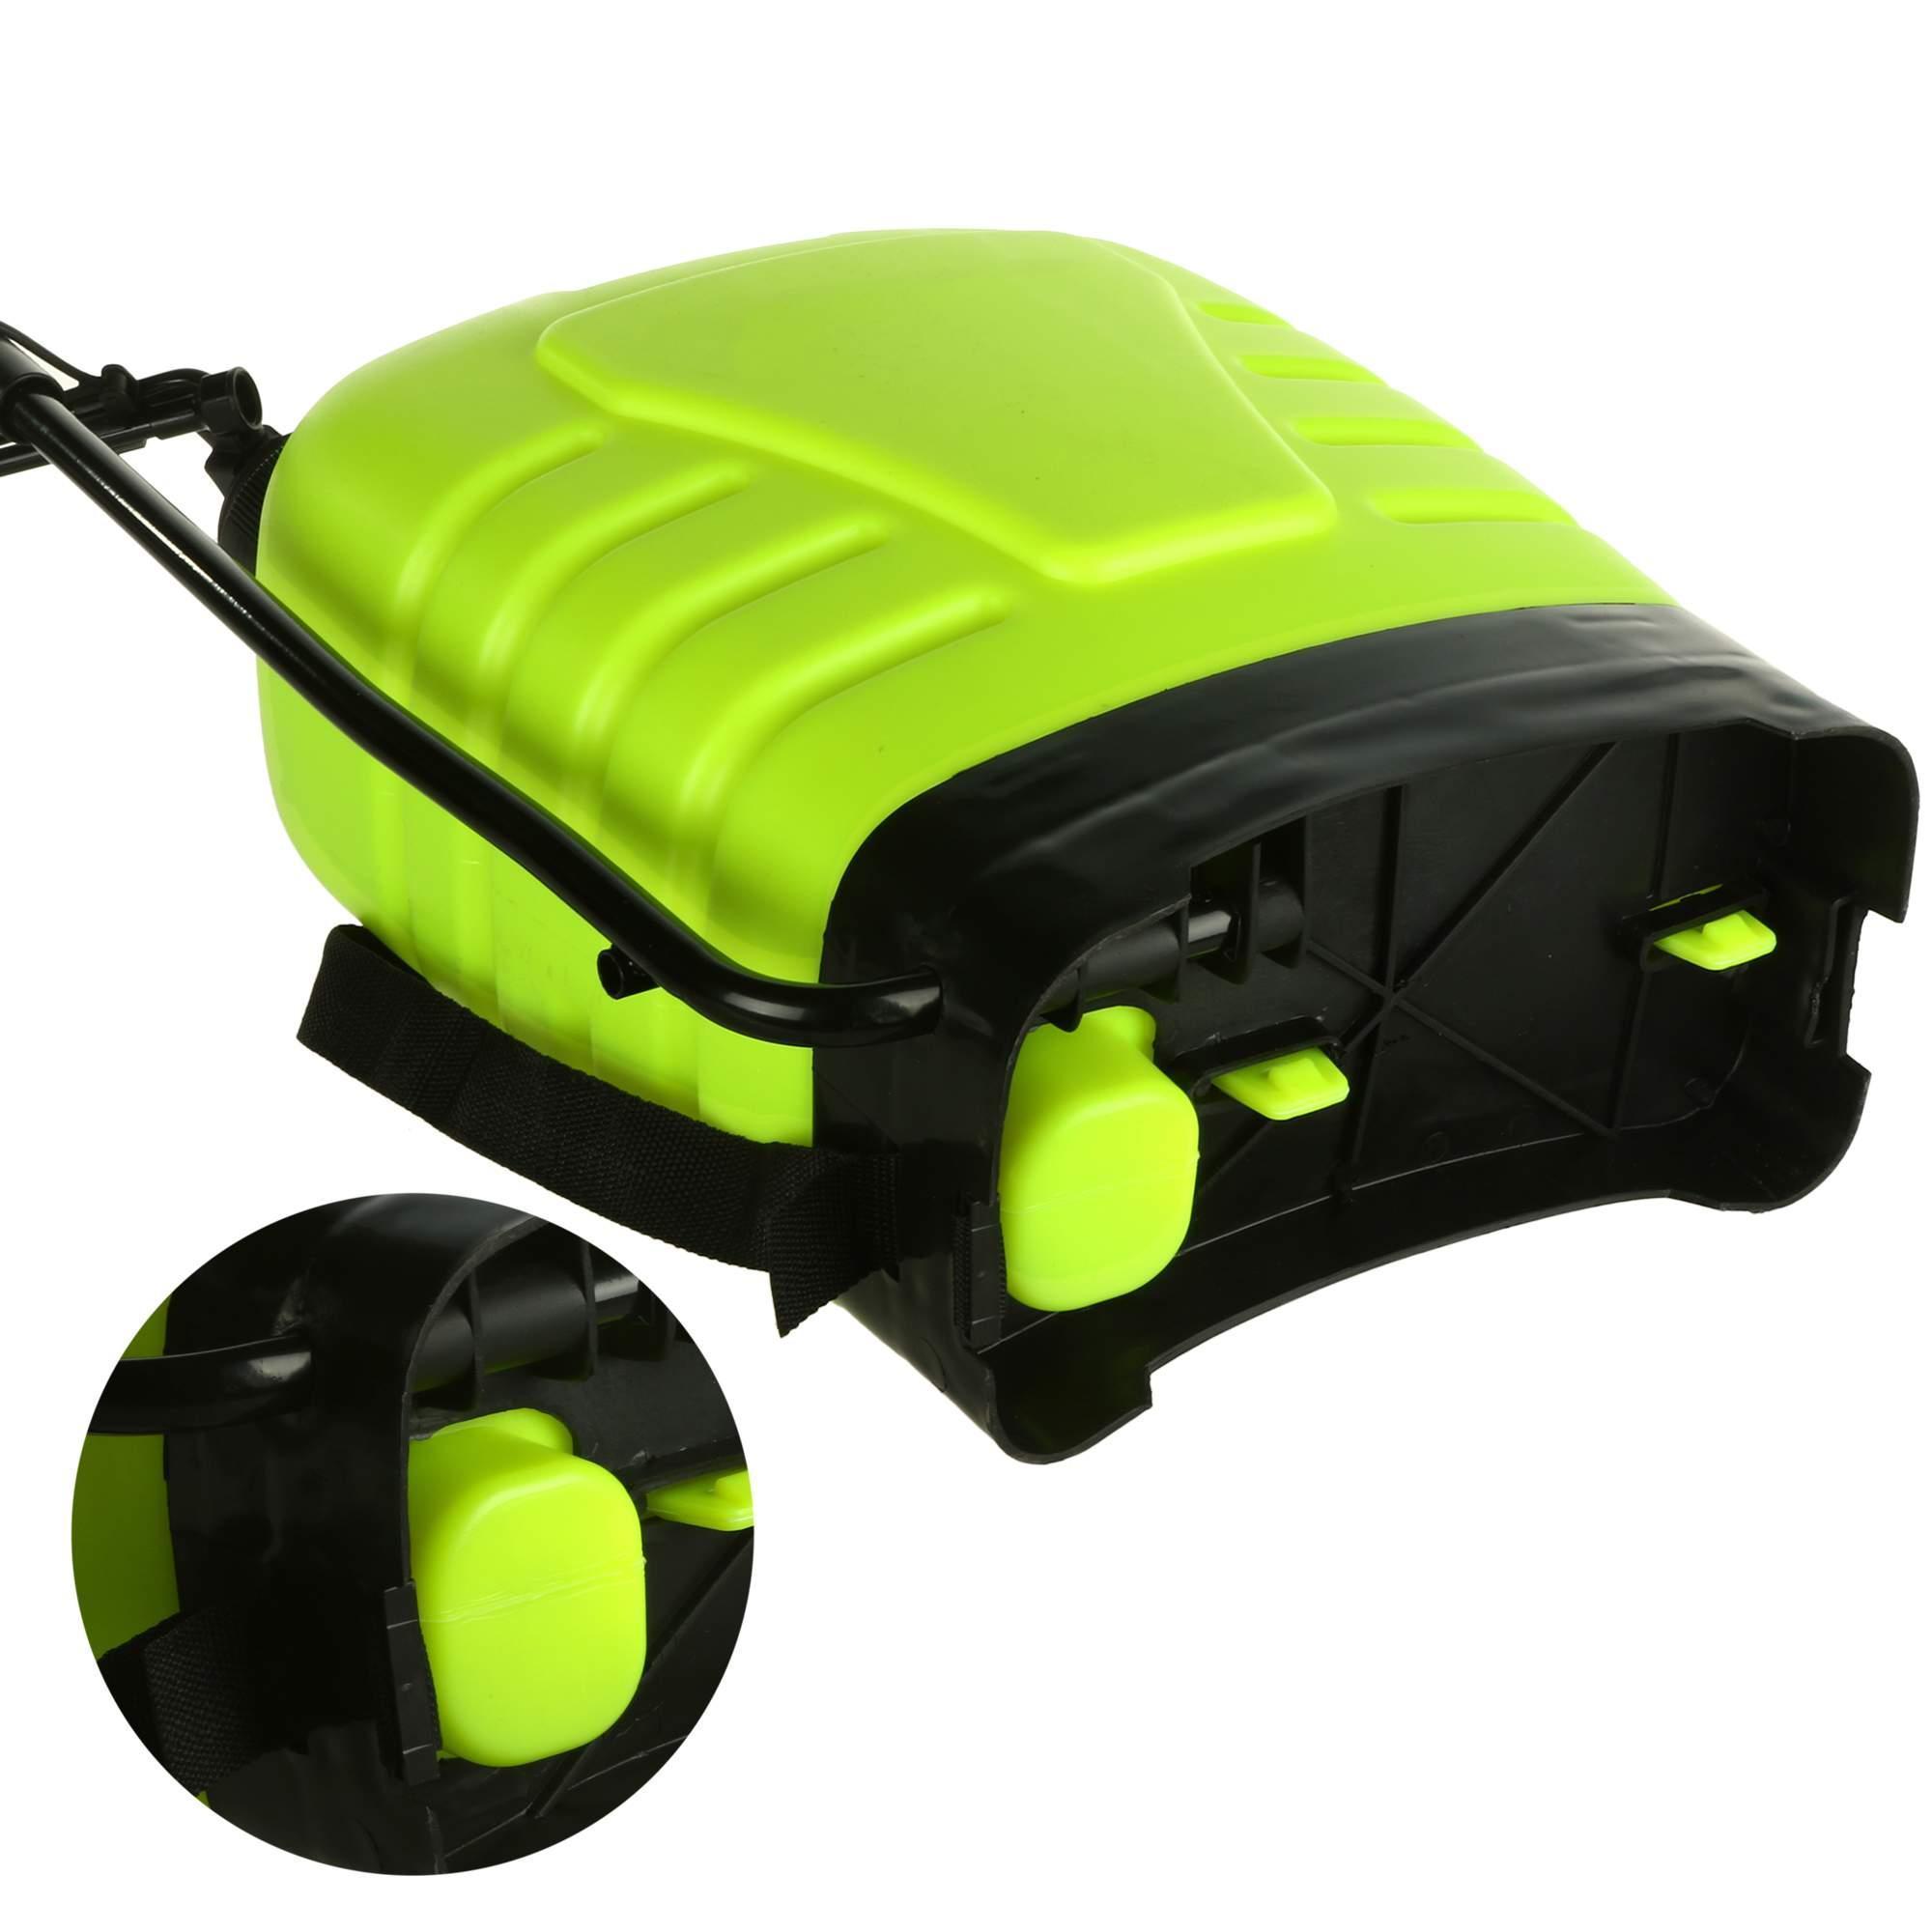 Portable Pressure Sprayer Knapsack 16L Garden Yard Weed Chemical 4